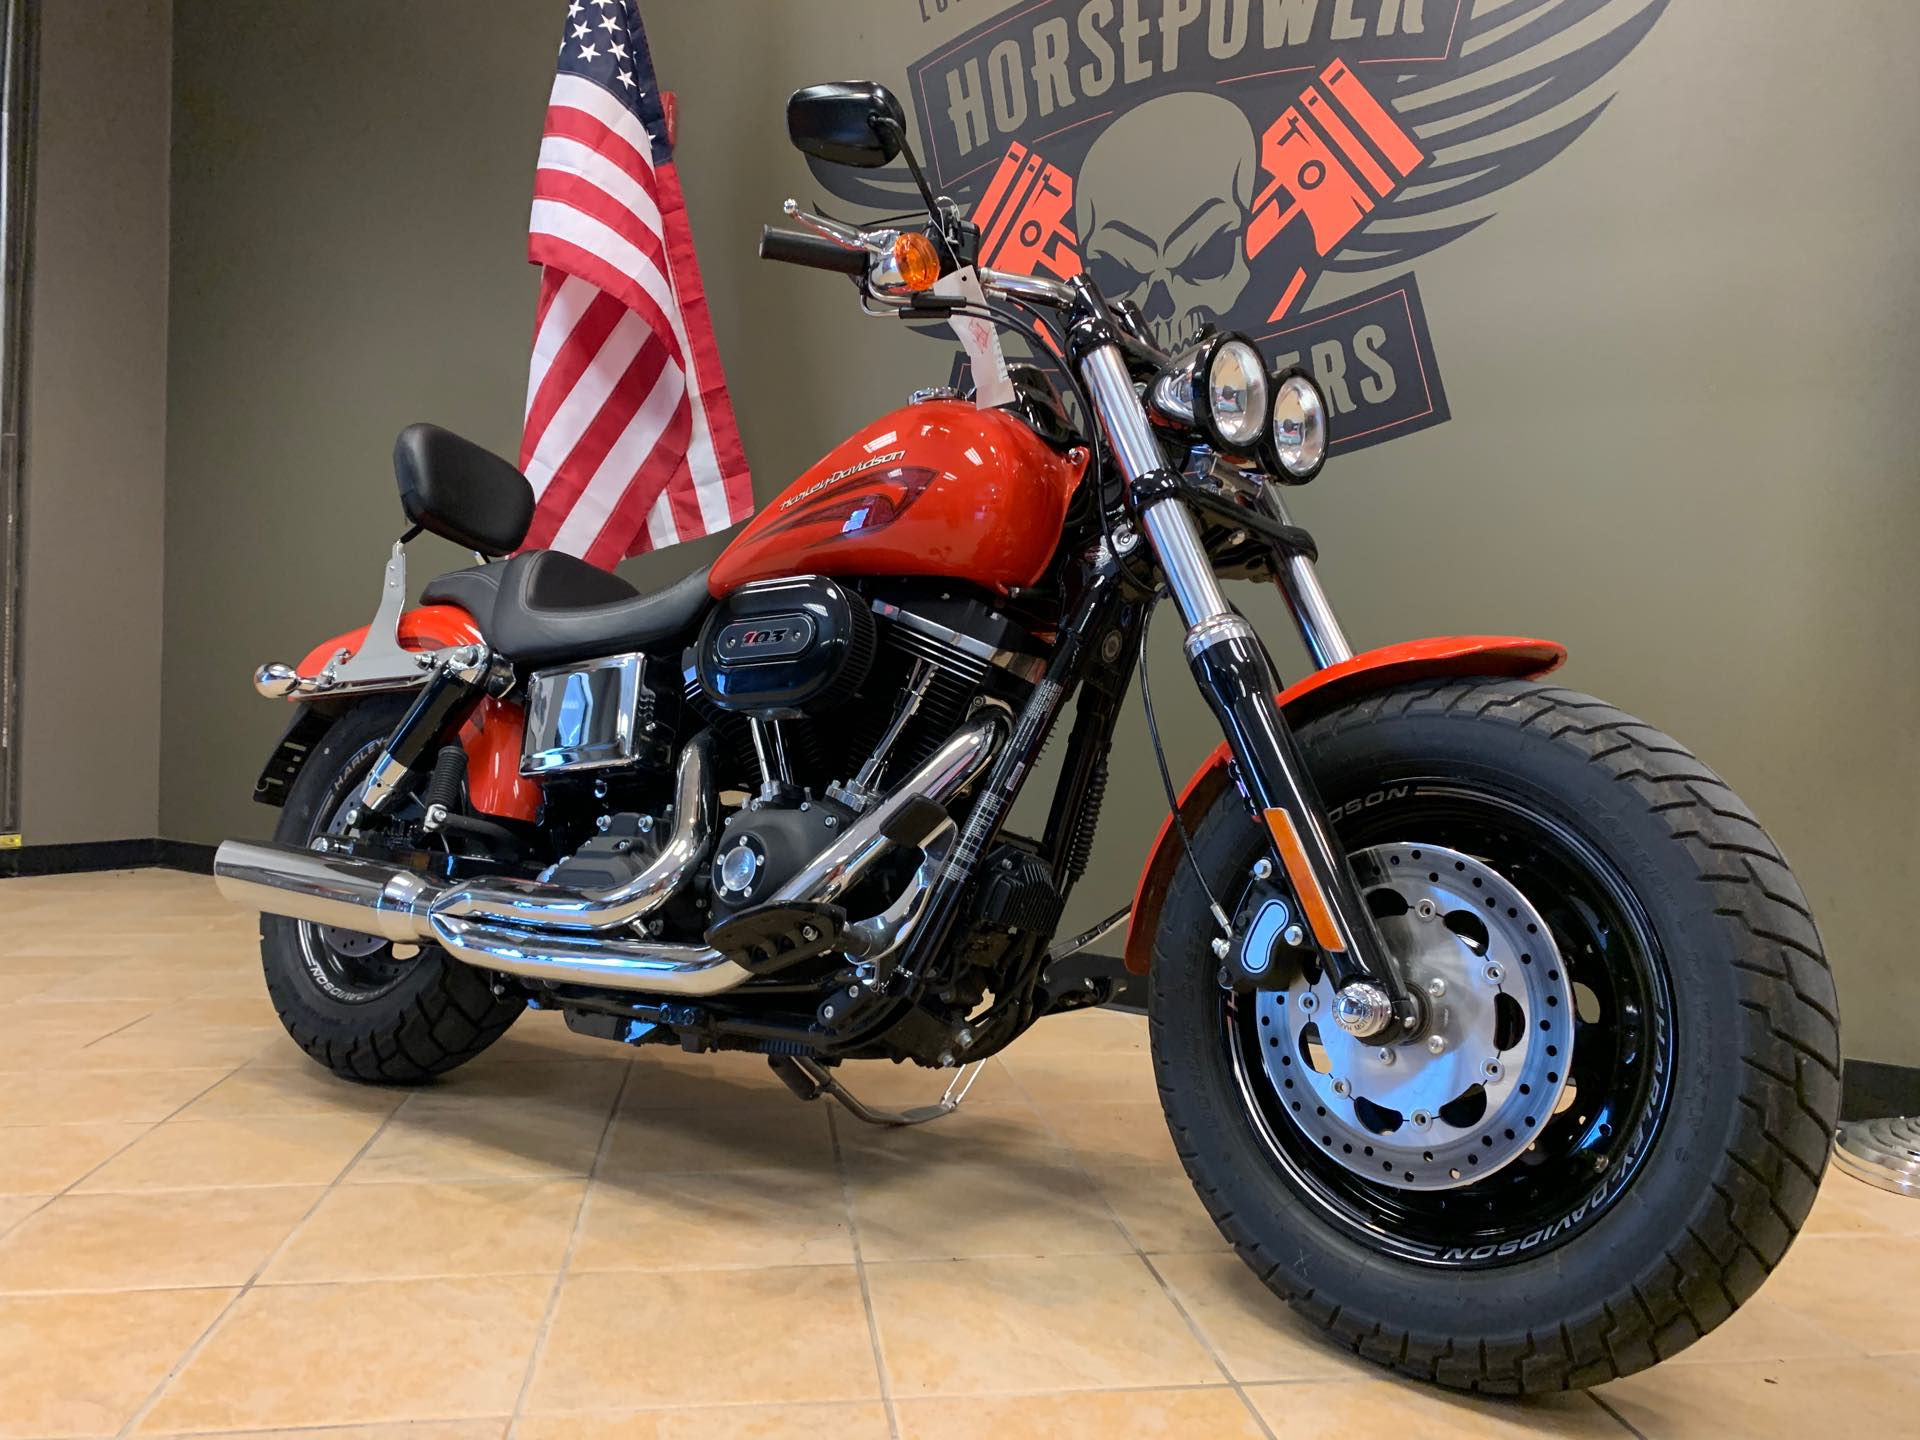 2017 Harley-Davidson Dyna Fat Bob at Loess Hills Harley-Davidson